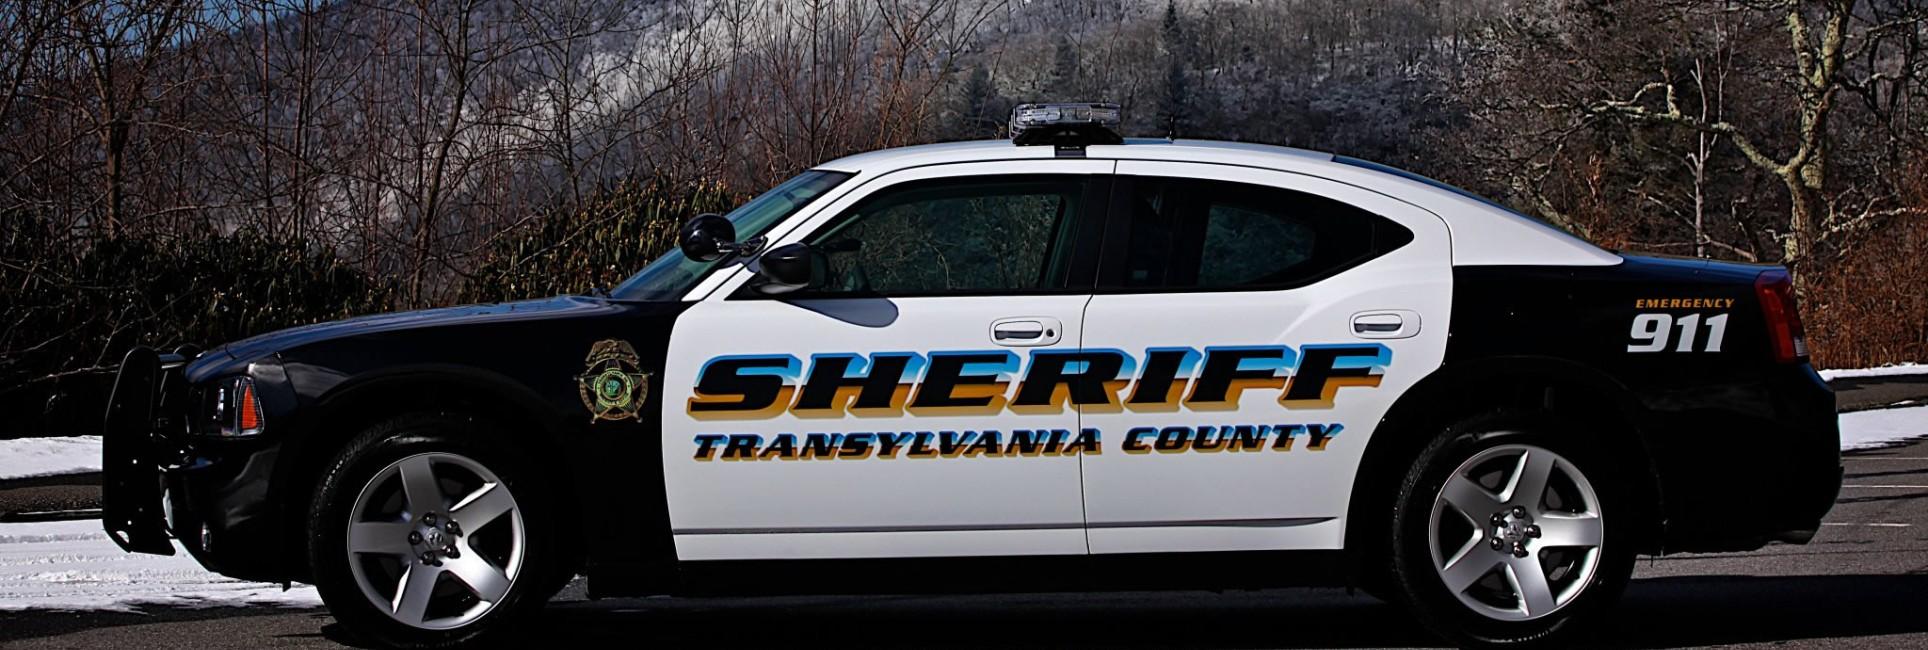 Careers | Transylvania County Sheriff's Office